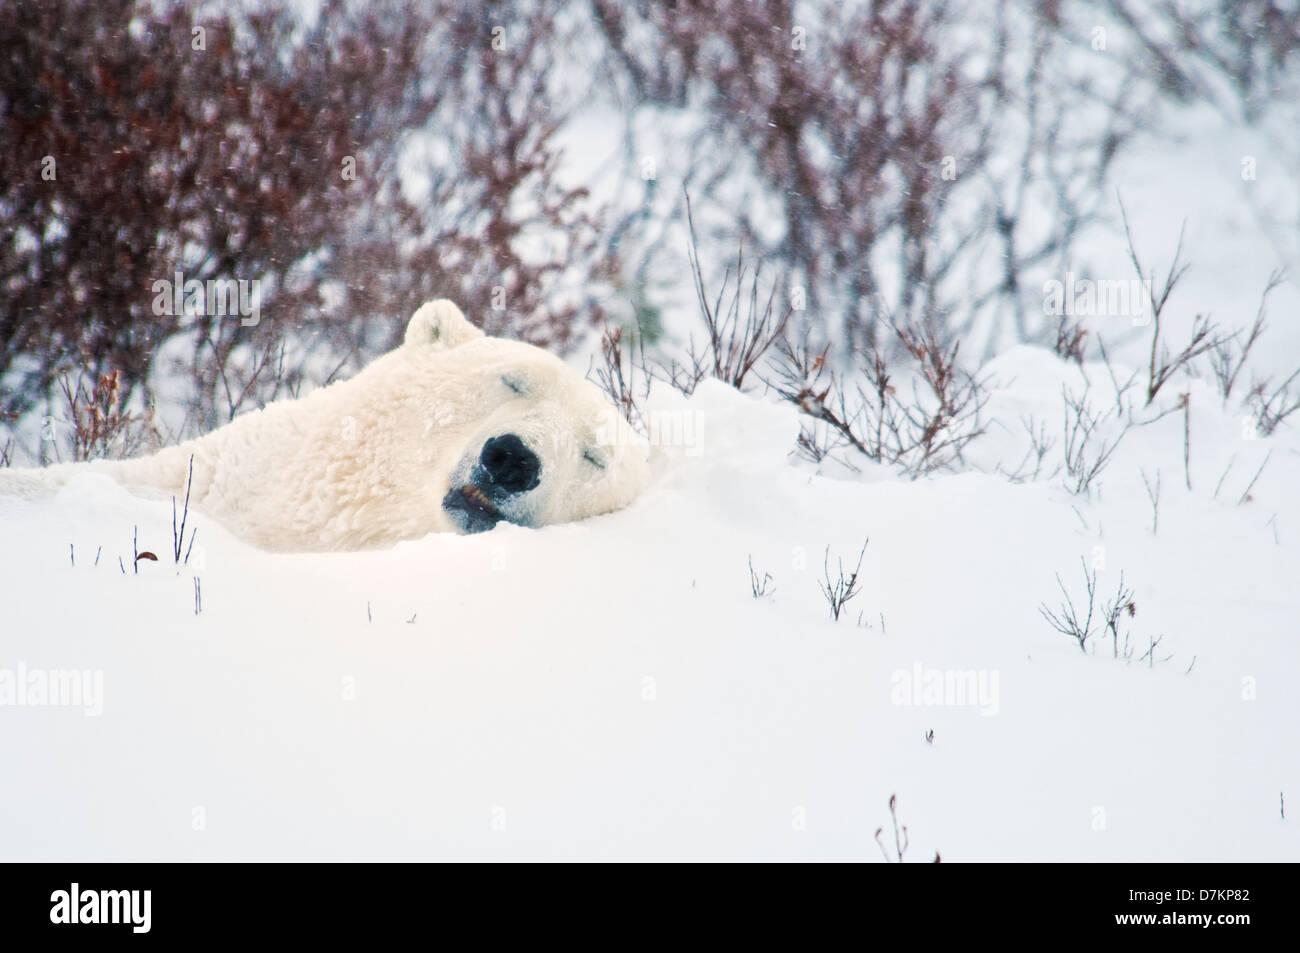 Polar Bear sleeping in the snow, Ursus maritimus, Wapusk National Park, near Hudson Bay, Cape Churchill, Manitoba, - Stock Image